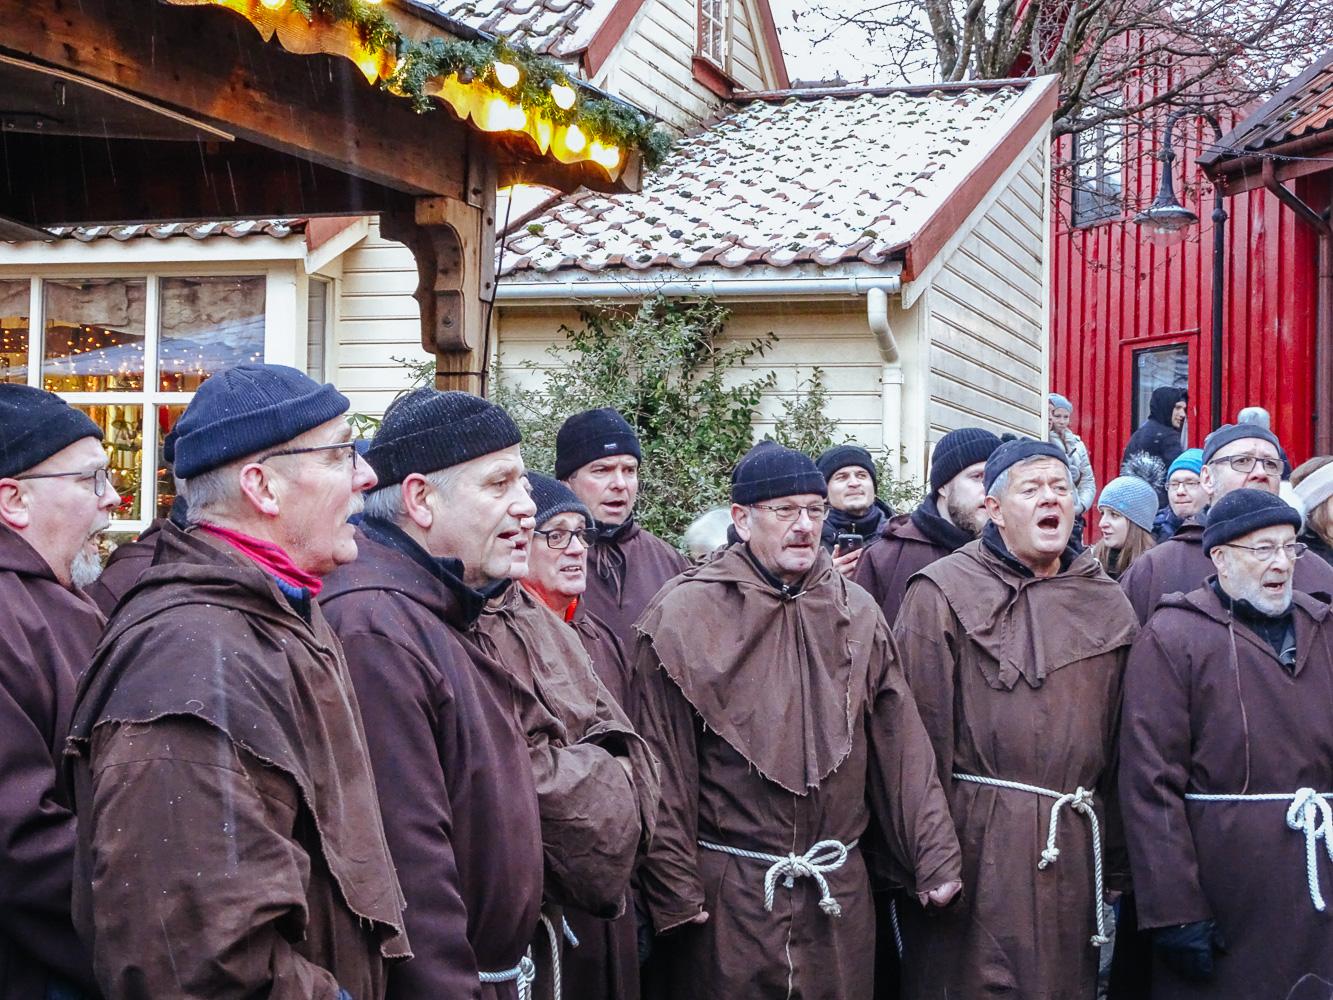 julebyen egersund visit norway stavanger christmas winter